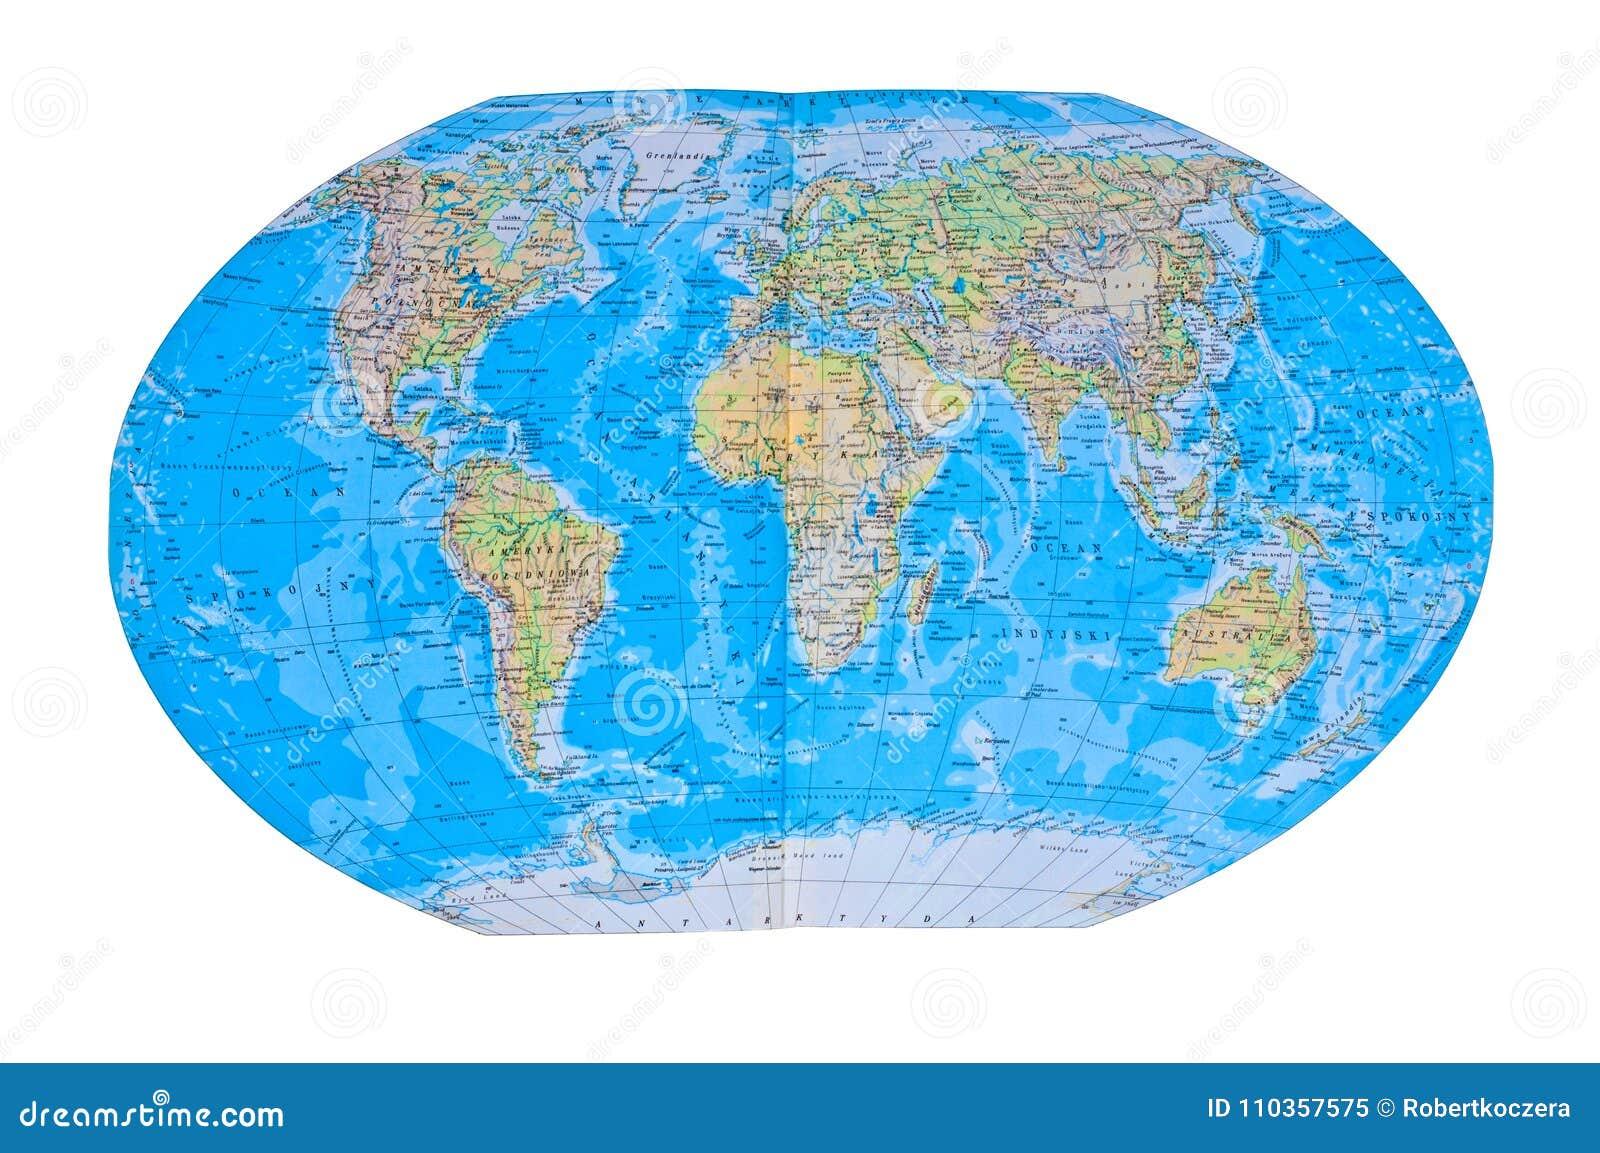 Detailed world map stock illustration illustration of australia detailed world map royalty free illustration download gumiabroncs Choice Image